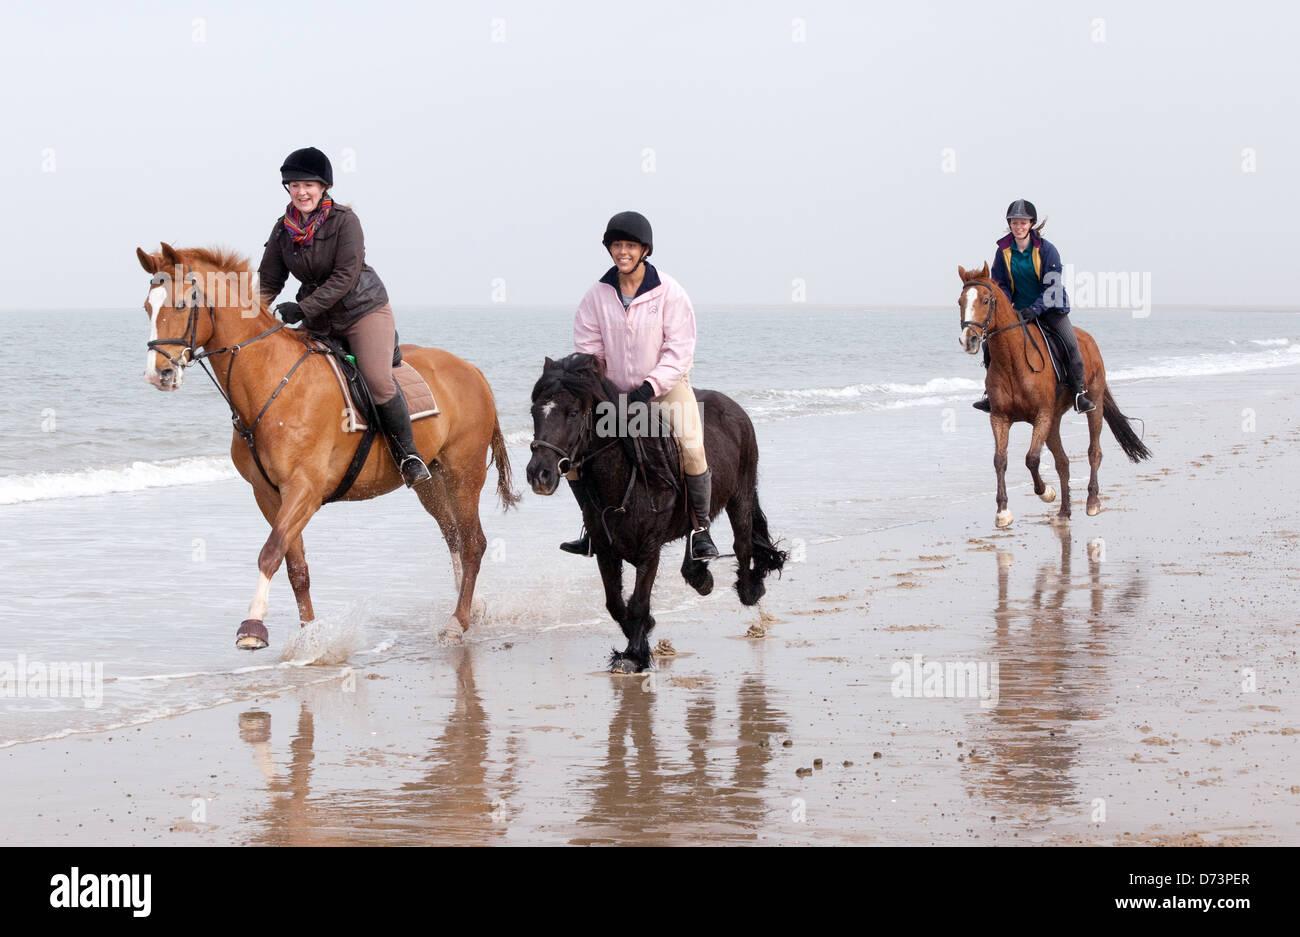 Three girls riding their horses, galloping on Holkham Beach, north Norfolk Coast, East Anglia UK - Stock Image